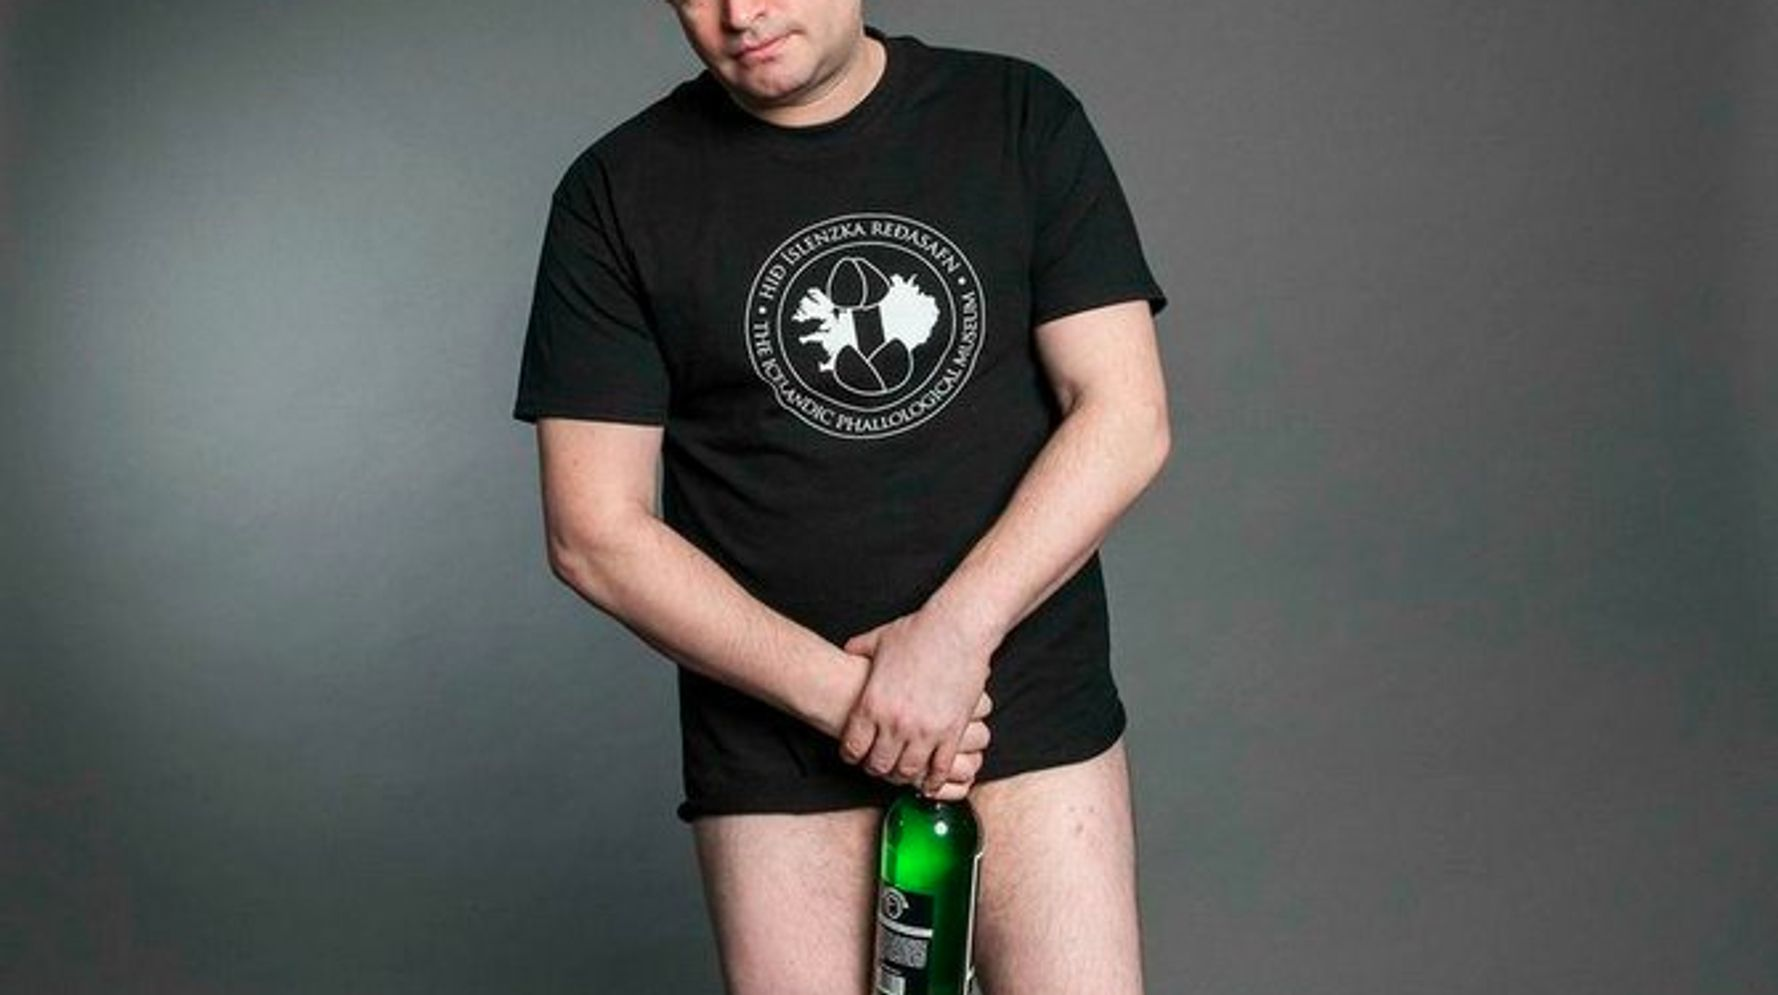 Longest dicks in the world